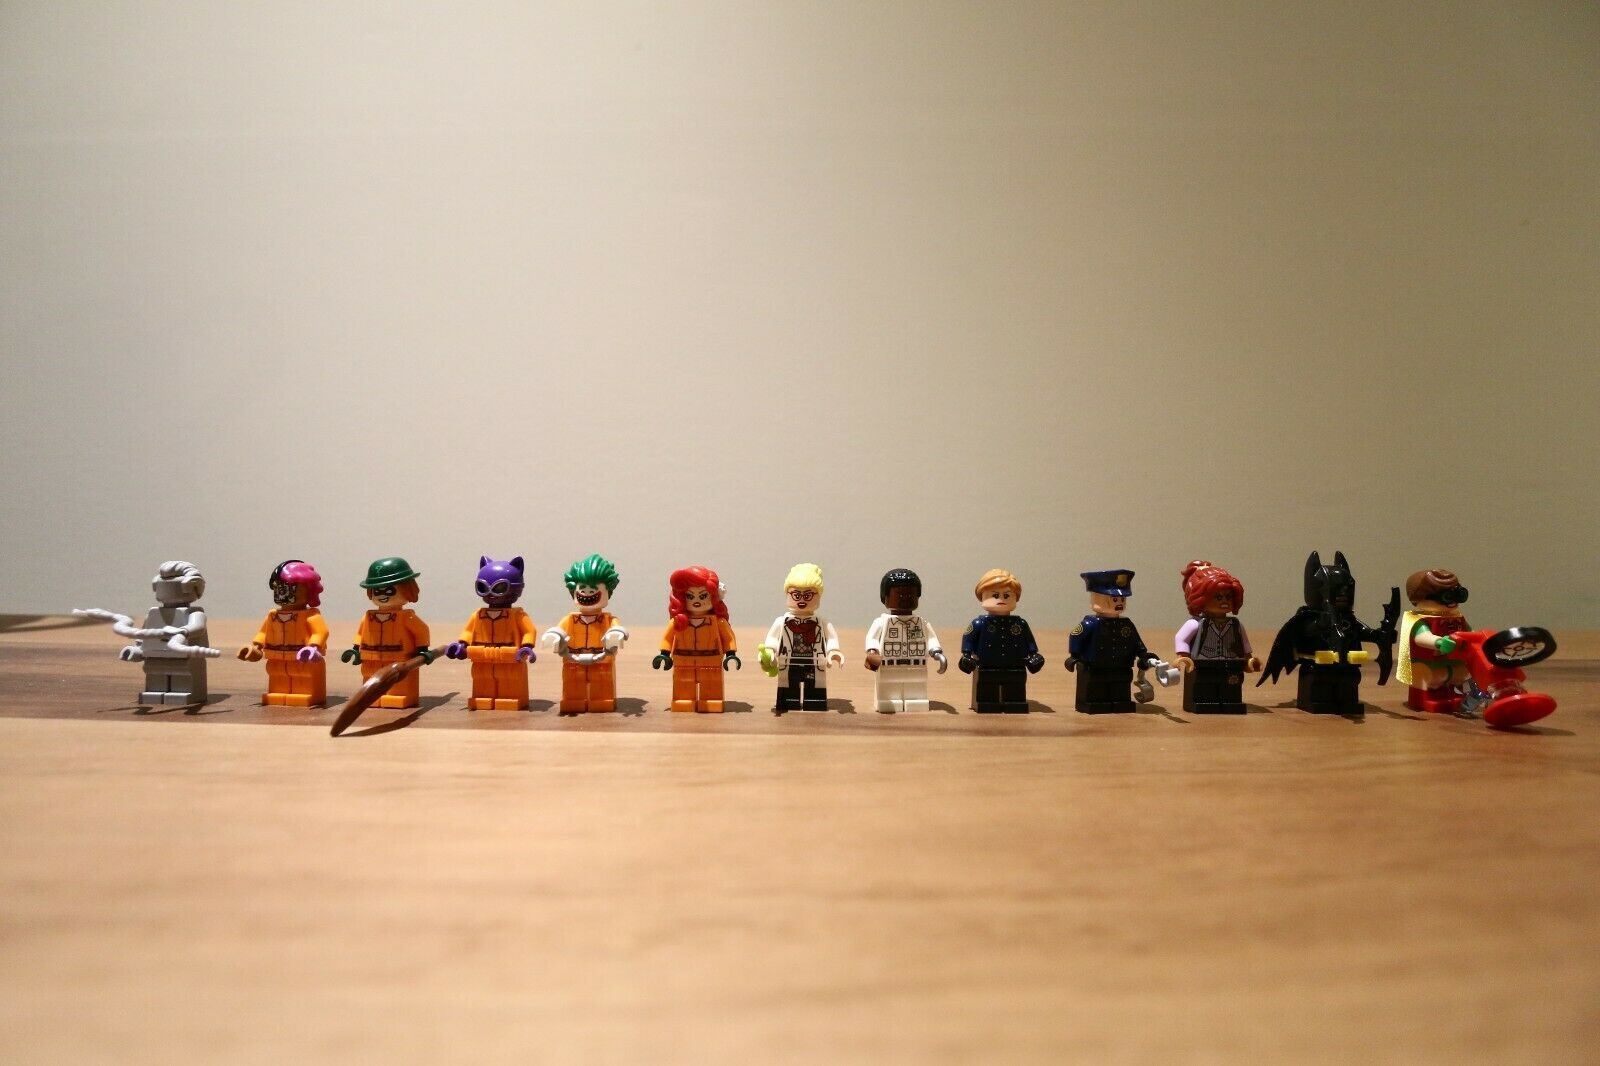 vendita online Lego batuomo movie 13 minicifras 70912 Arkham Arkham Arkham Asylum Barbara gordon prison suit  sconti e altro